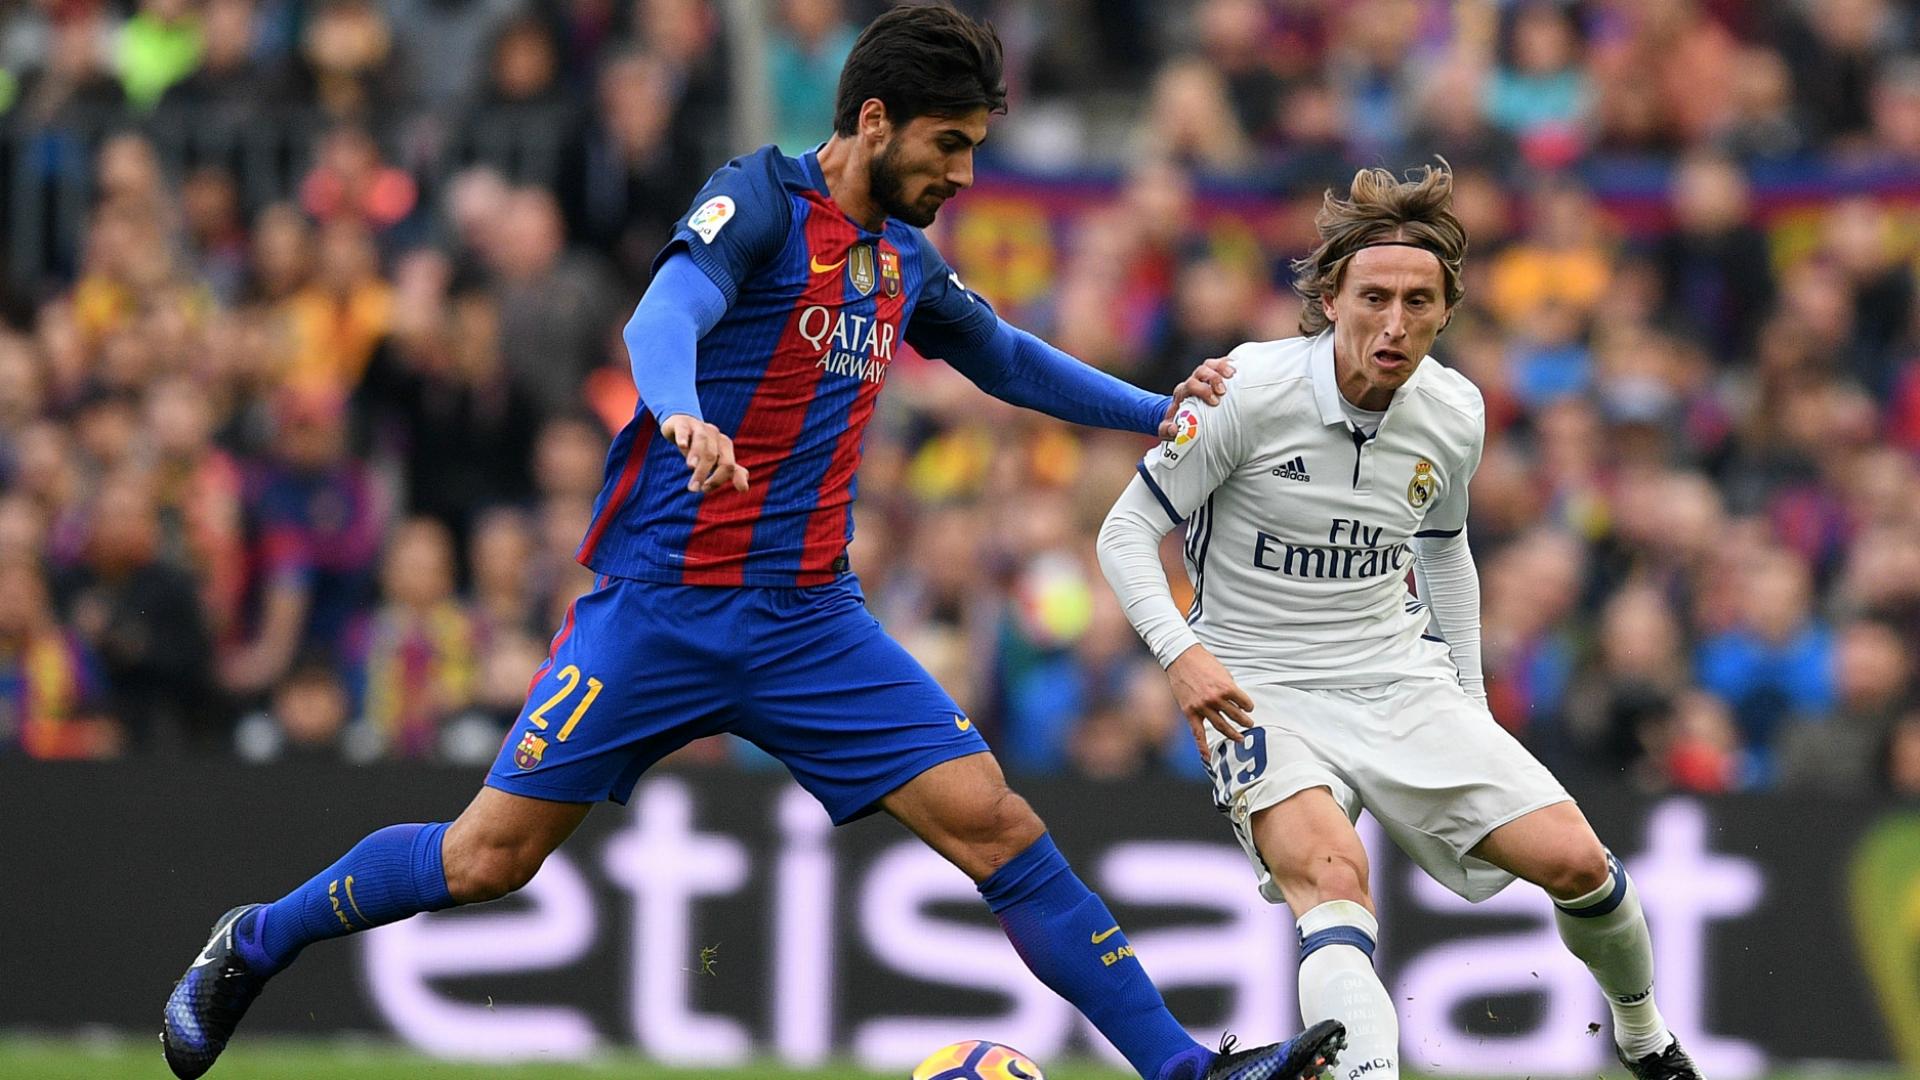 Andre Gomes Luka Modric Barcelona Real Madrid La Liga